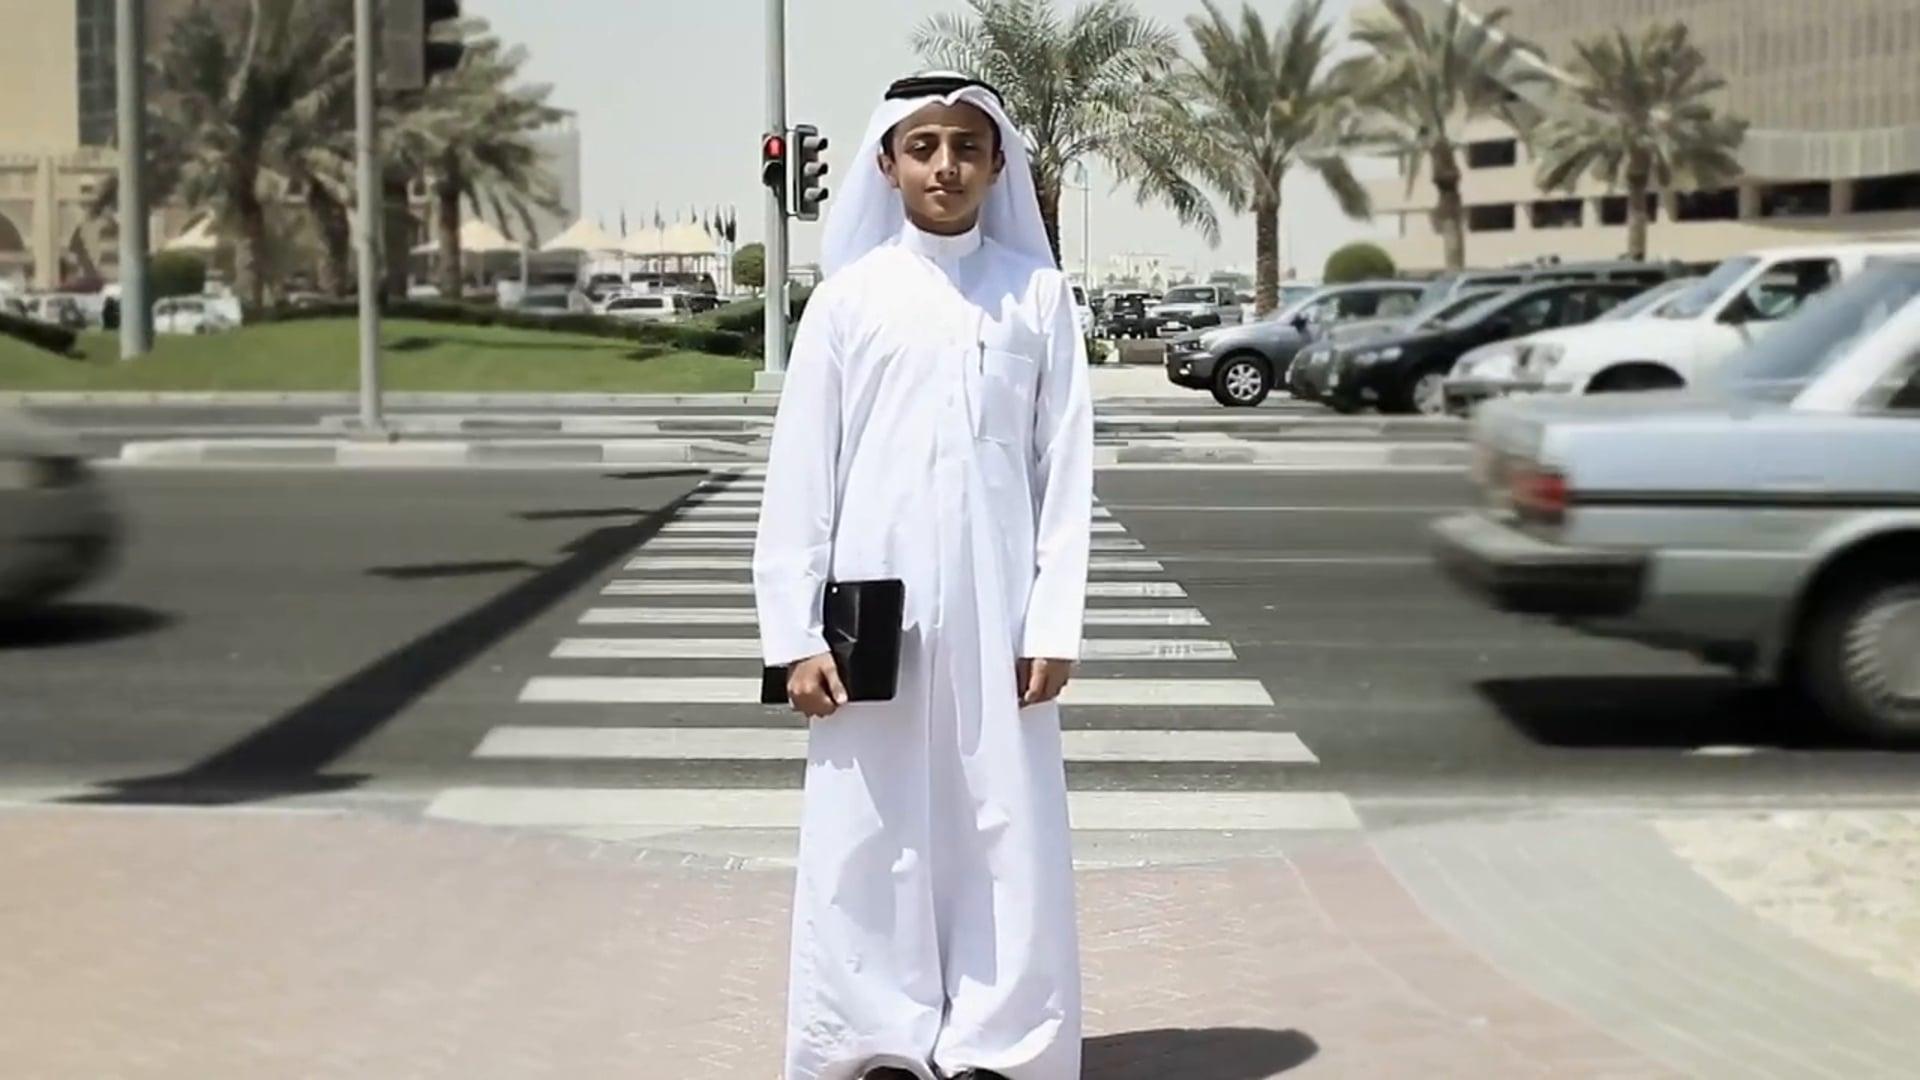 Mircosoft Surface Tablets in Qatar